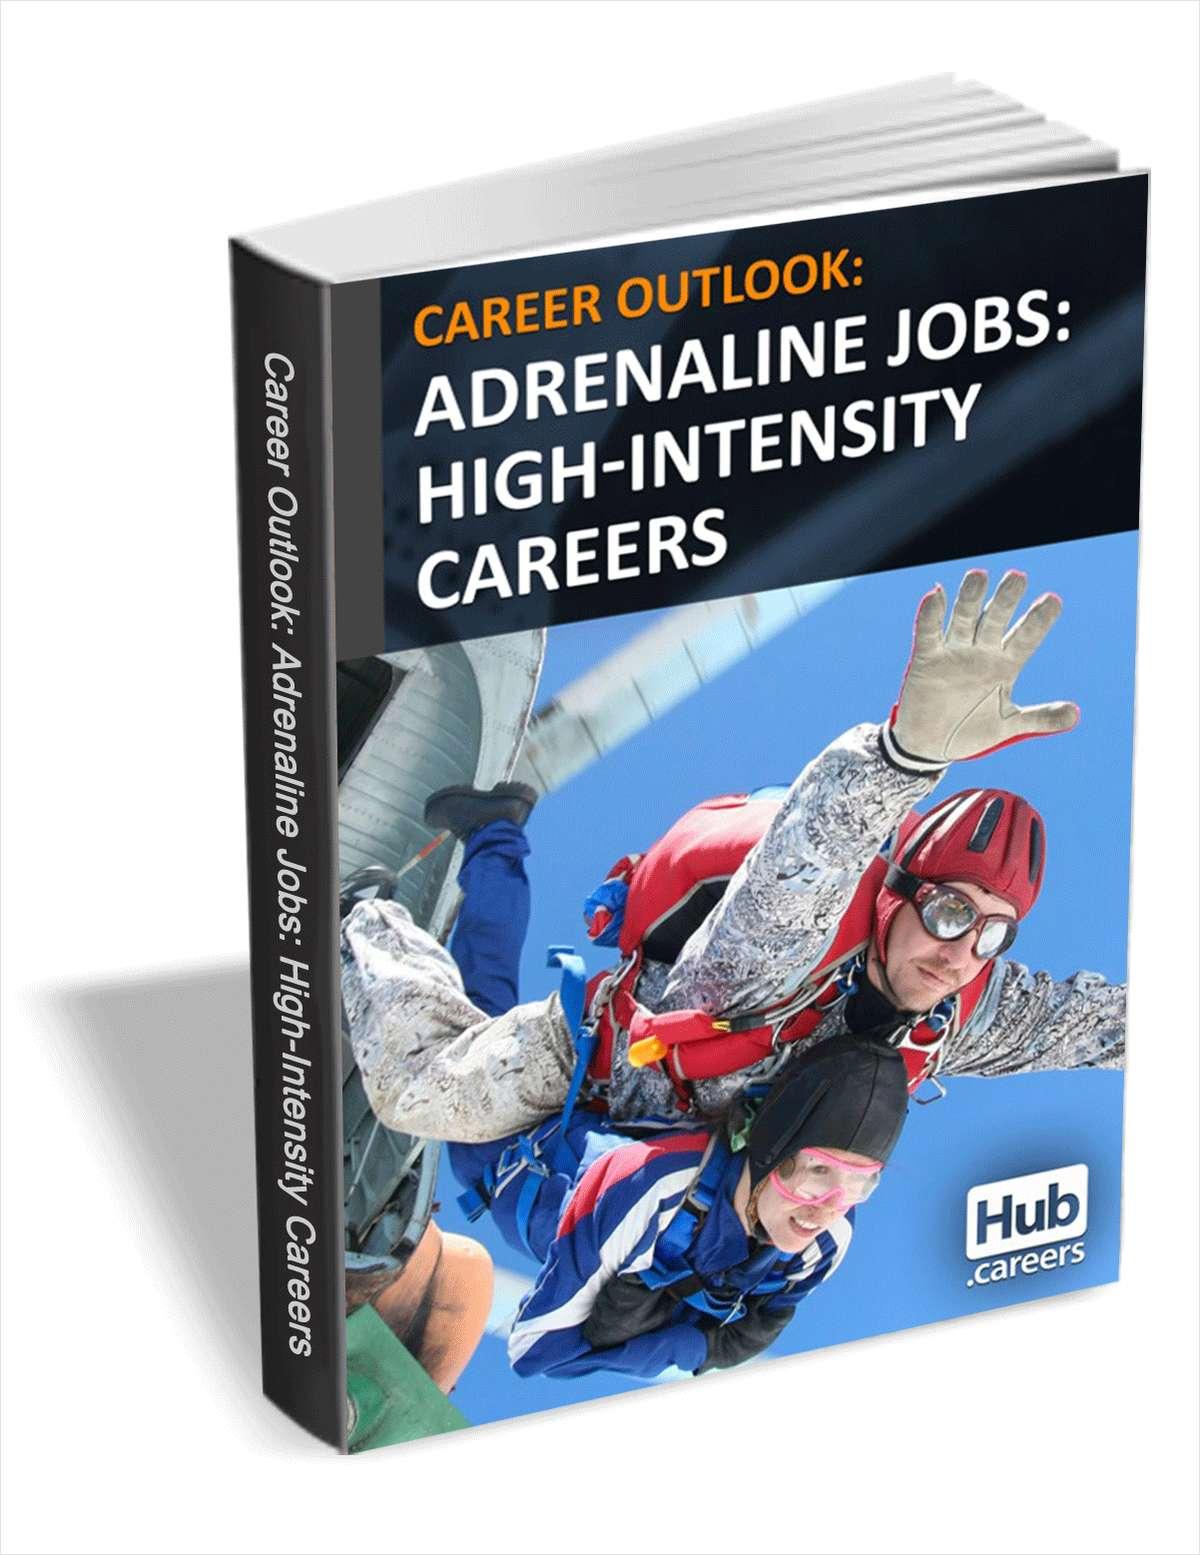 Adrenaline Jobs: High Intensity Careers - Career Outlook